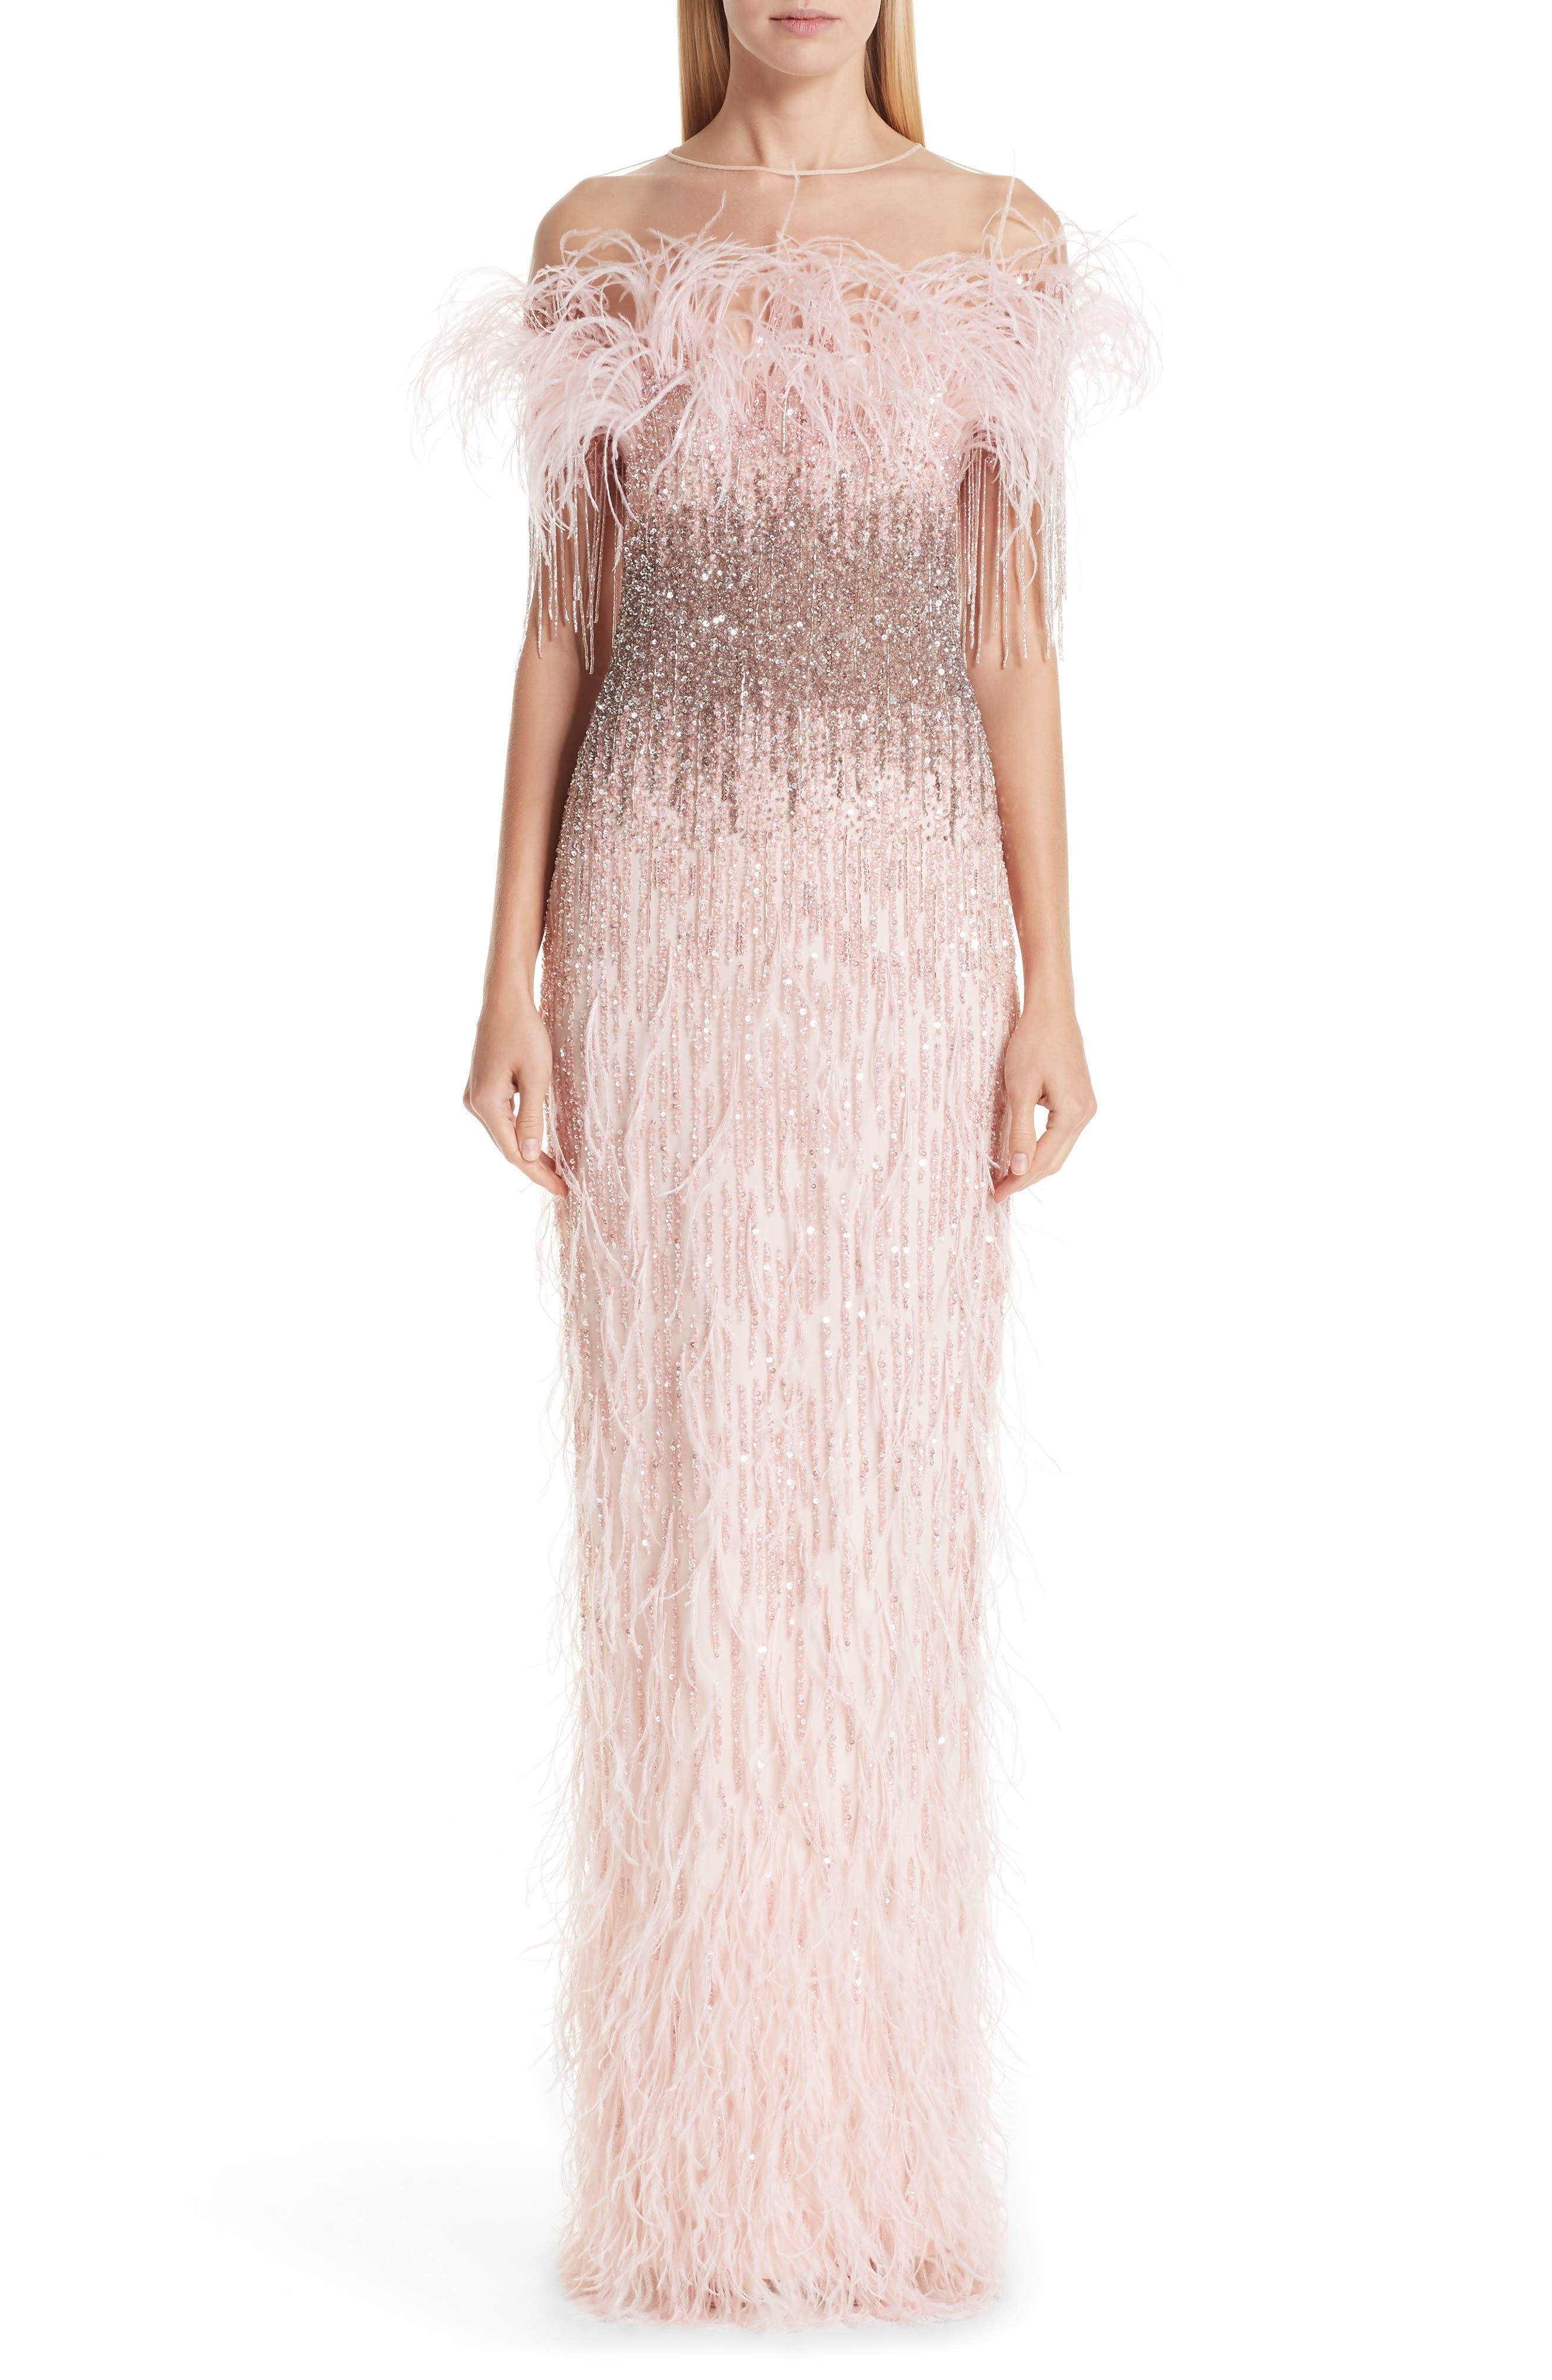 Pamella Roland Feather Trim Embellished Column Gown, Pink